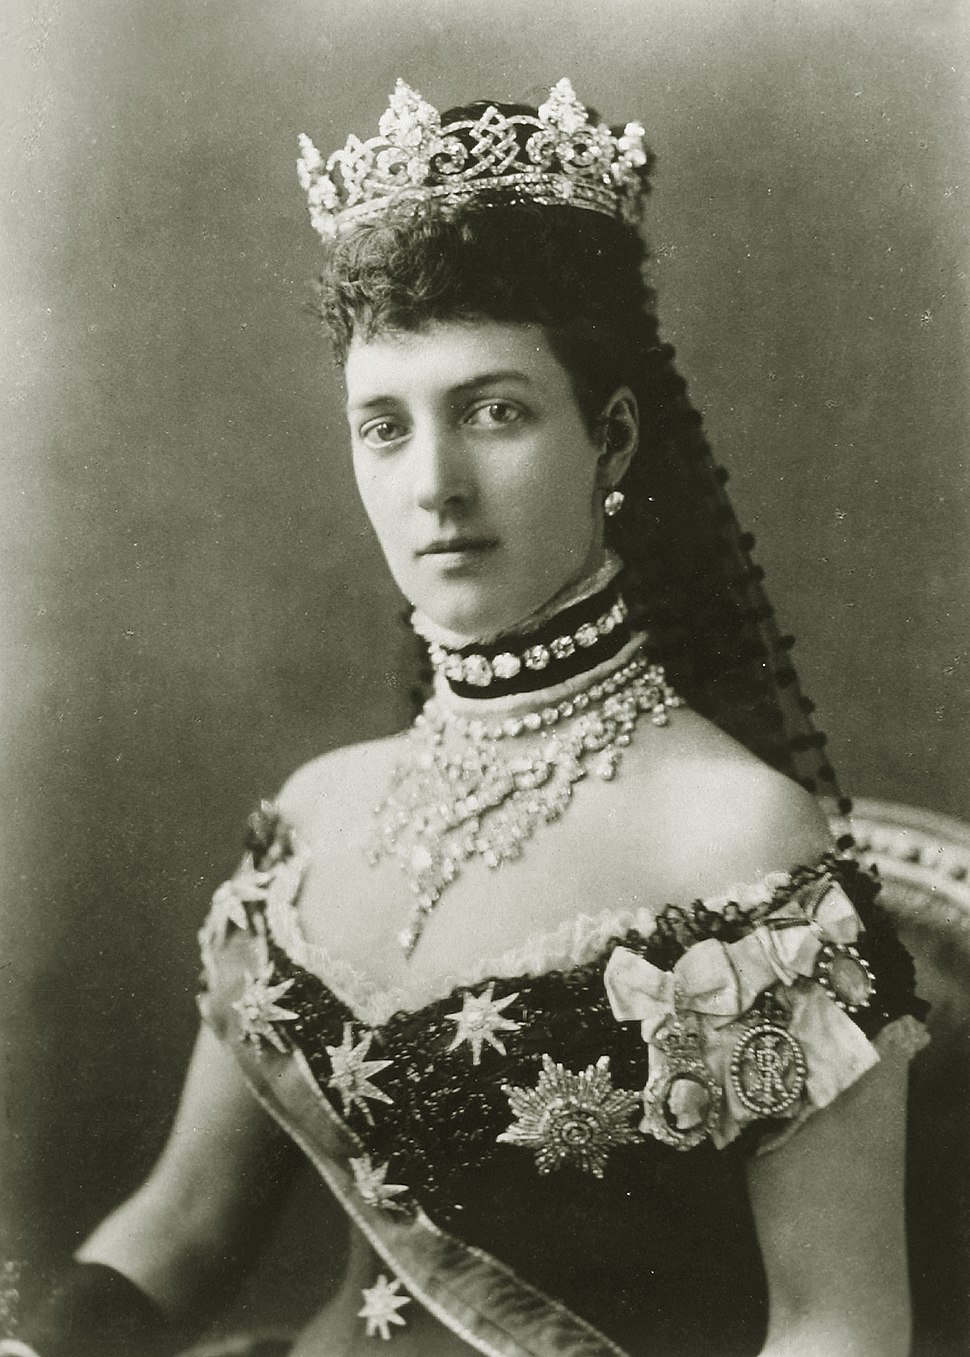 Queen Alexandra, the Princess of Wales